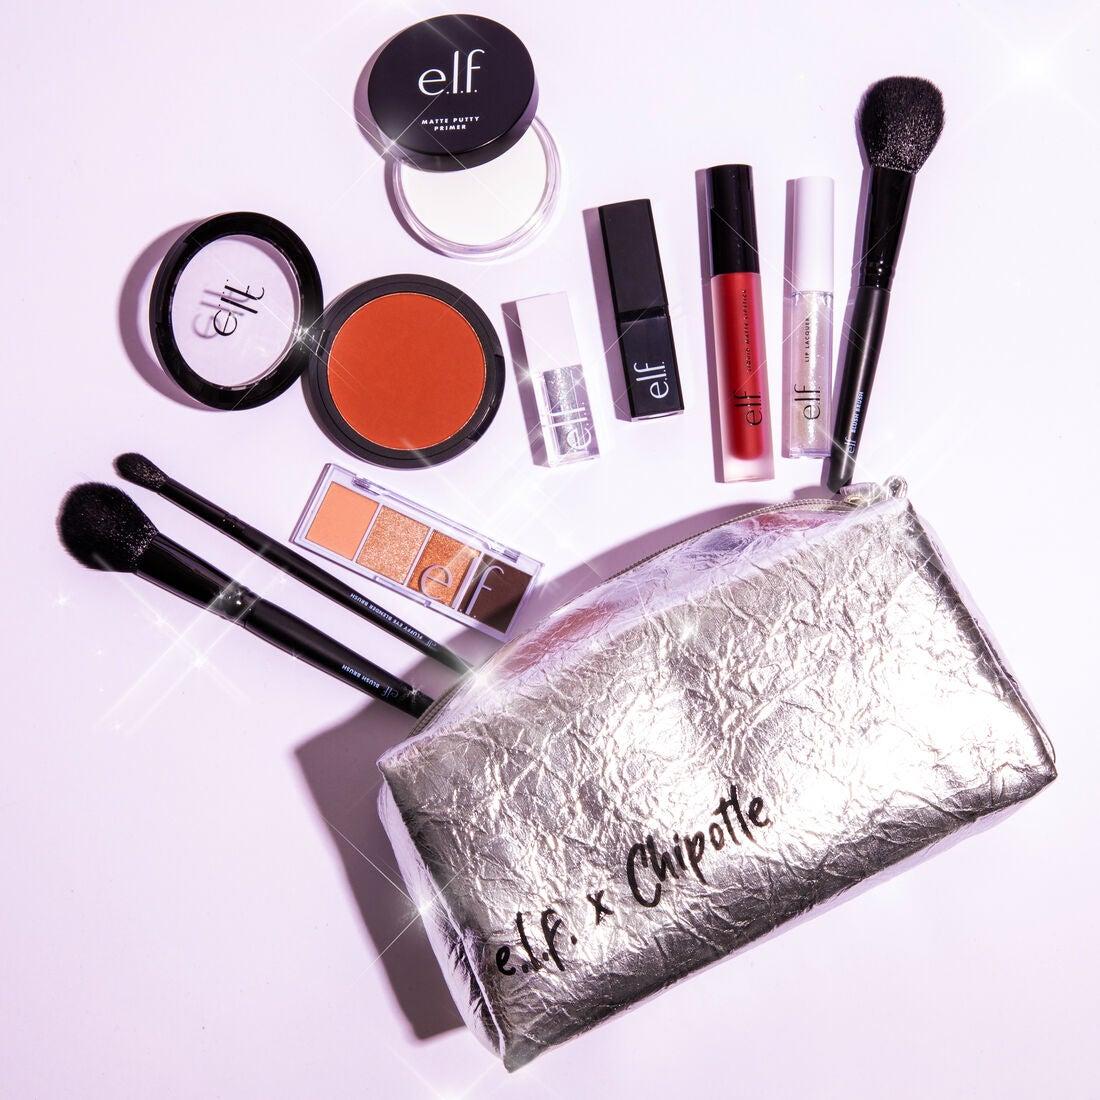 E L F Makeup Limited Edition Chipotle